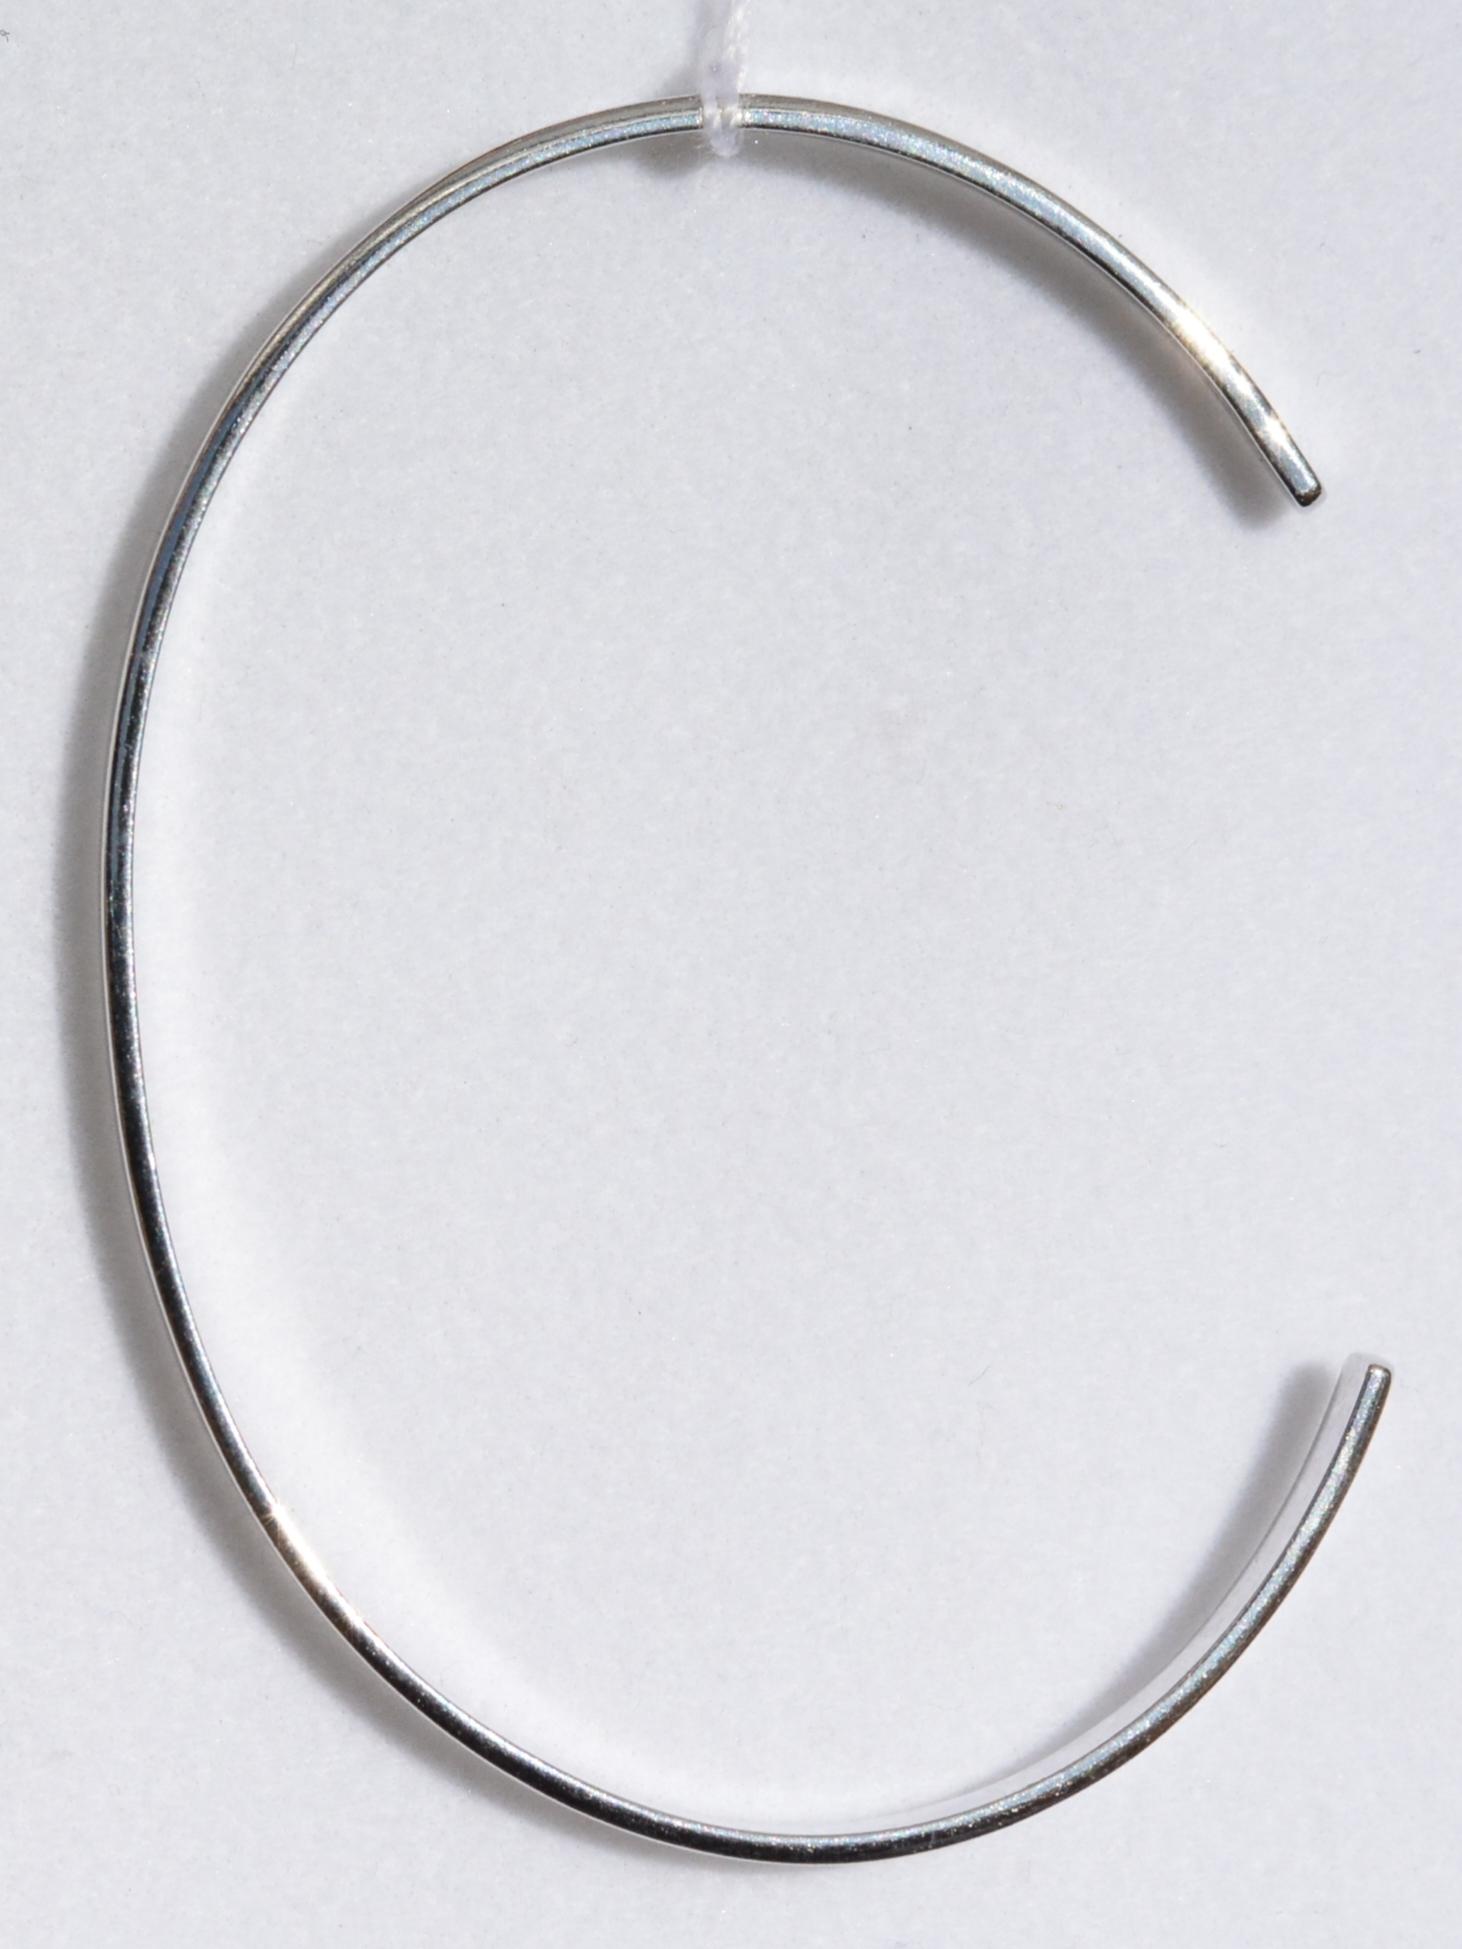 Лента 0,4 (браслет из серебра)